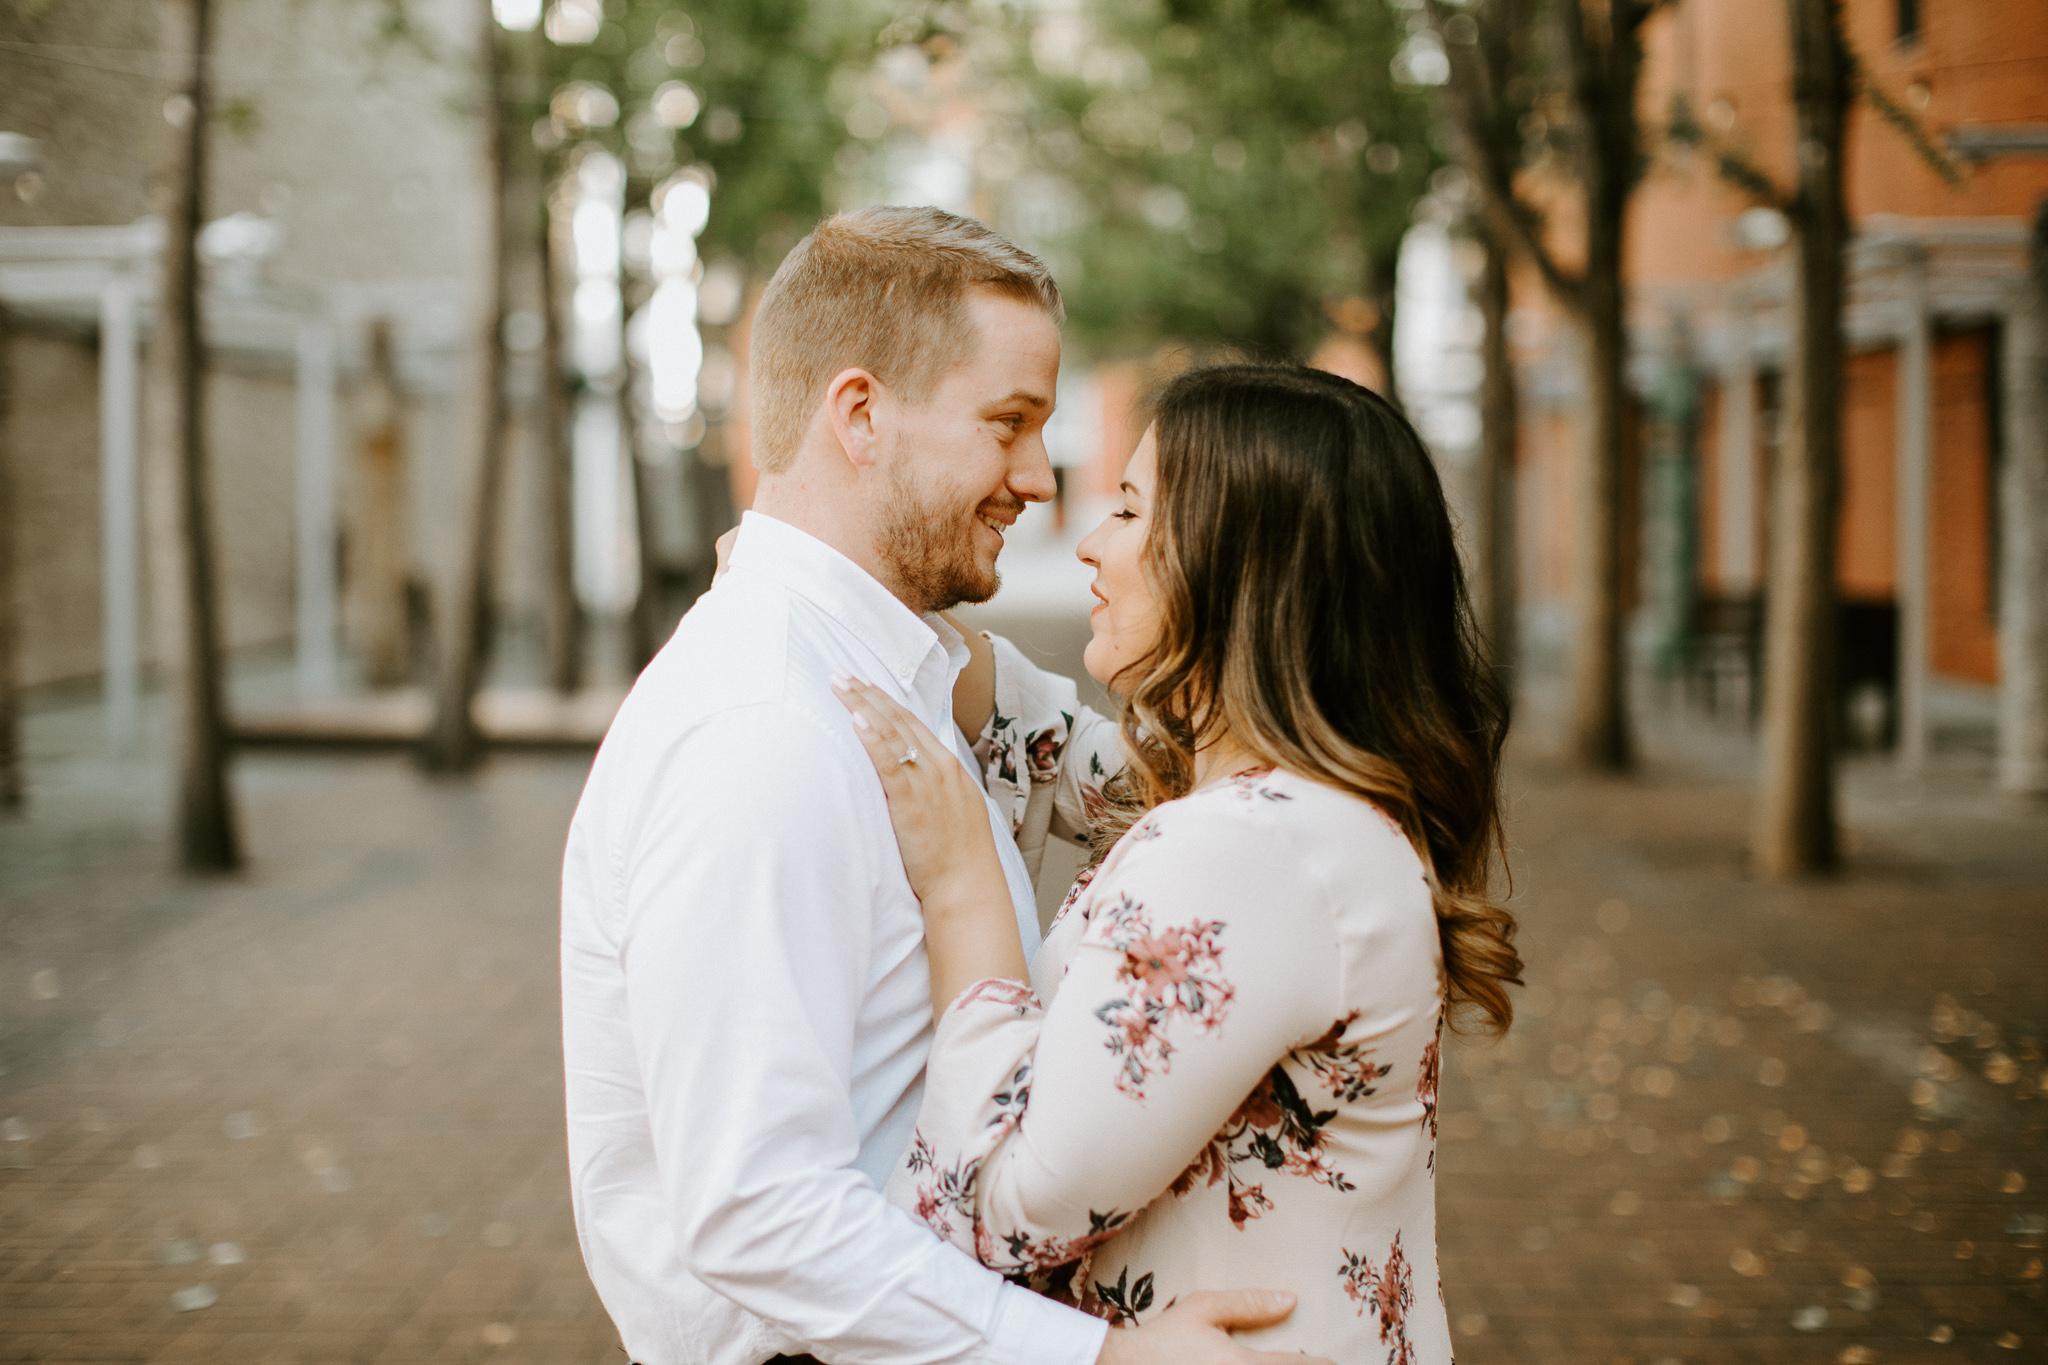 Engagement - Downtown Roanoke -  Wedding Photographer - Virginia - Best - Pat Cori Photography.jpg